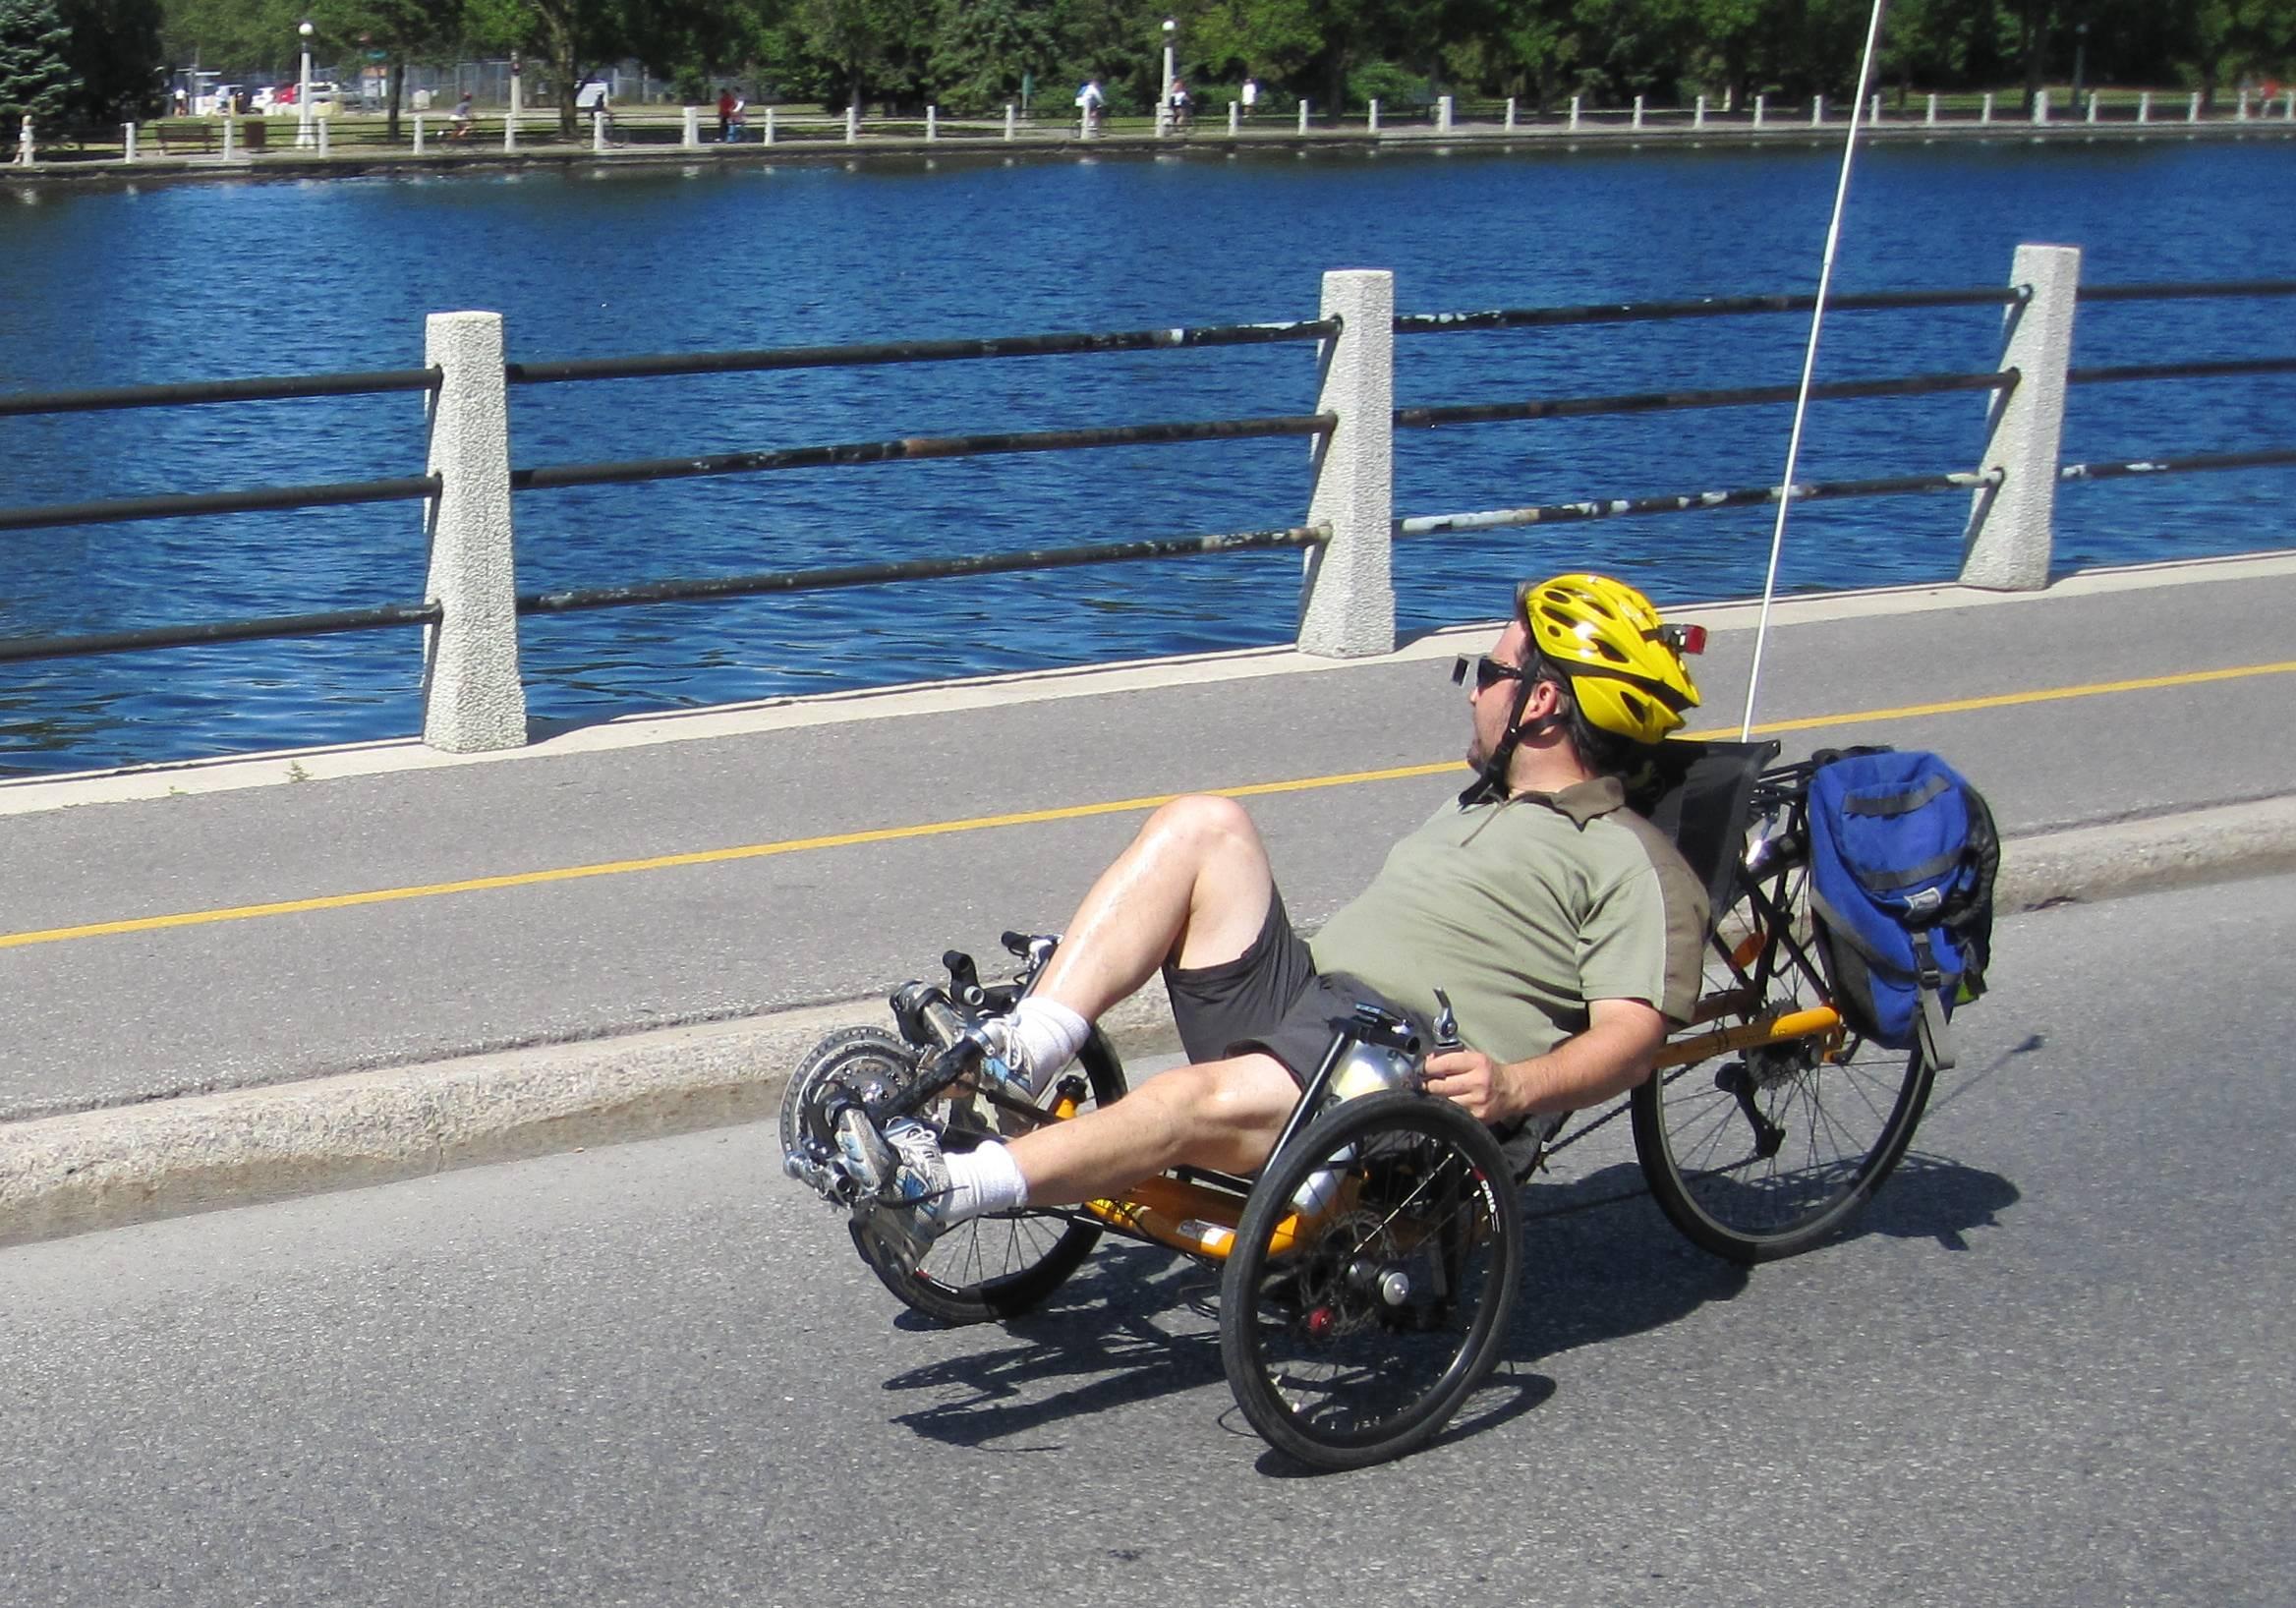 2011-07-24-ottawa-bicycle-culture-6